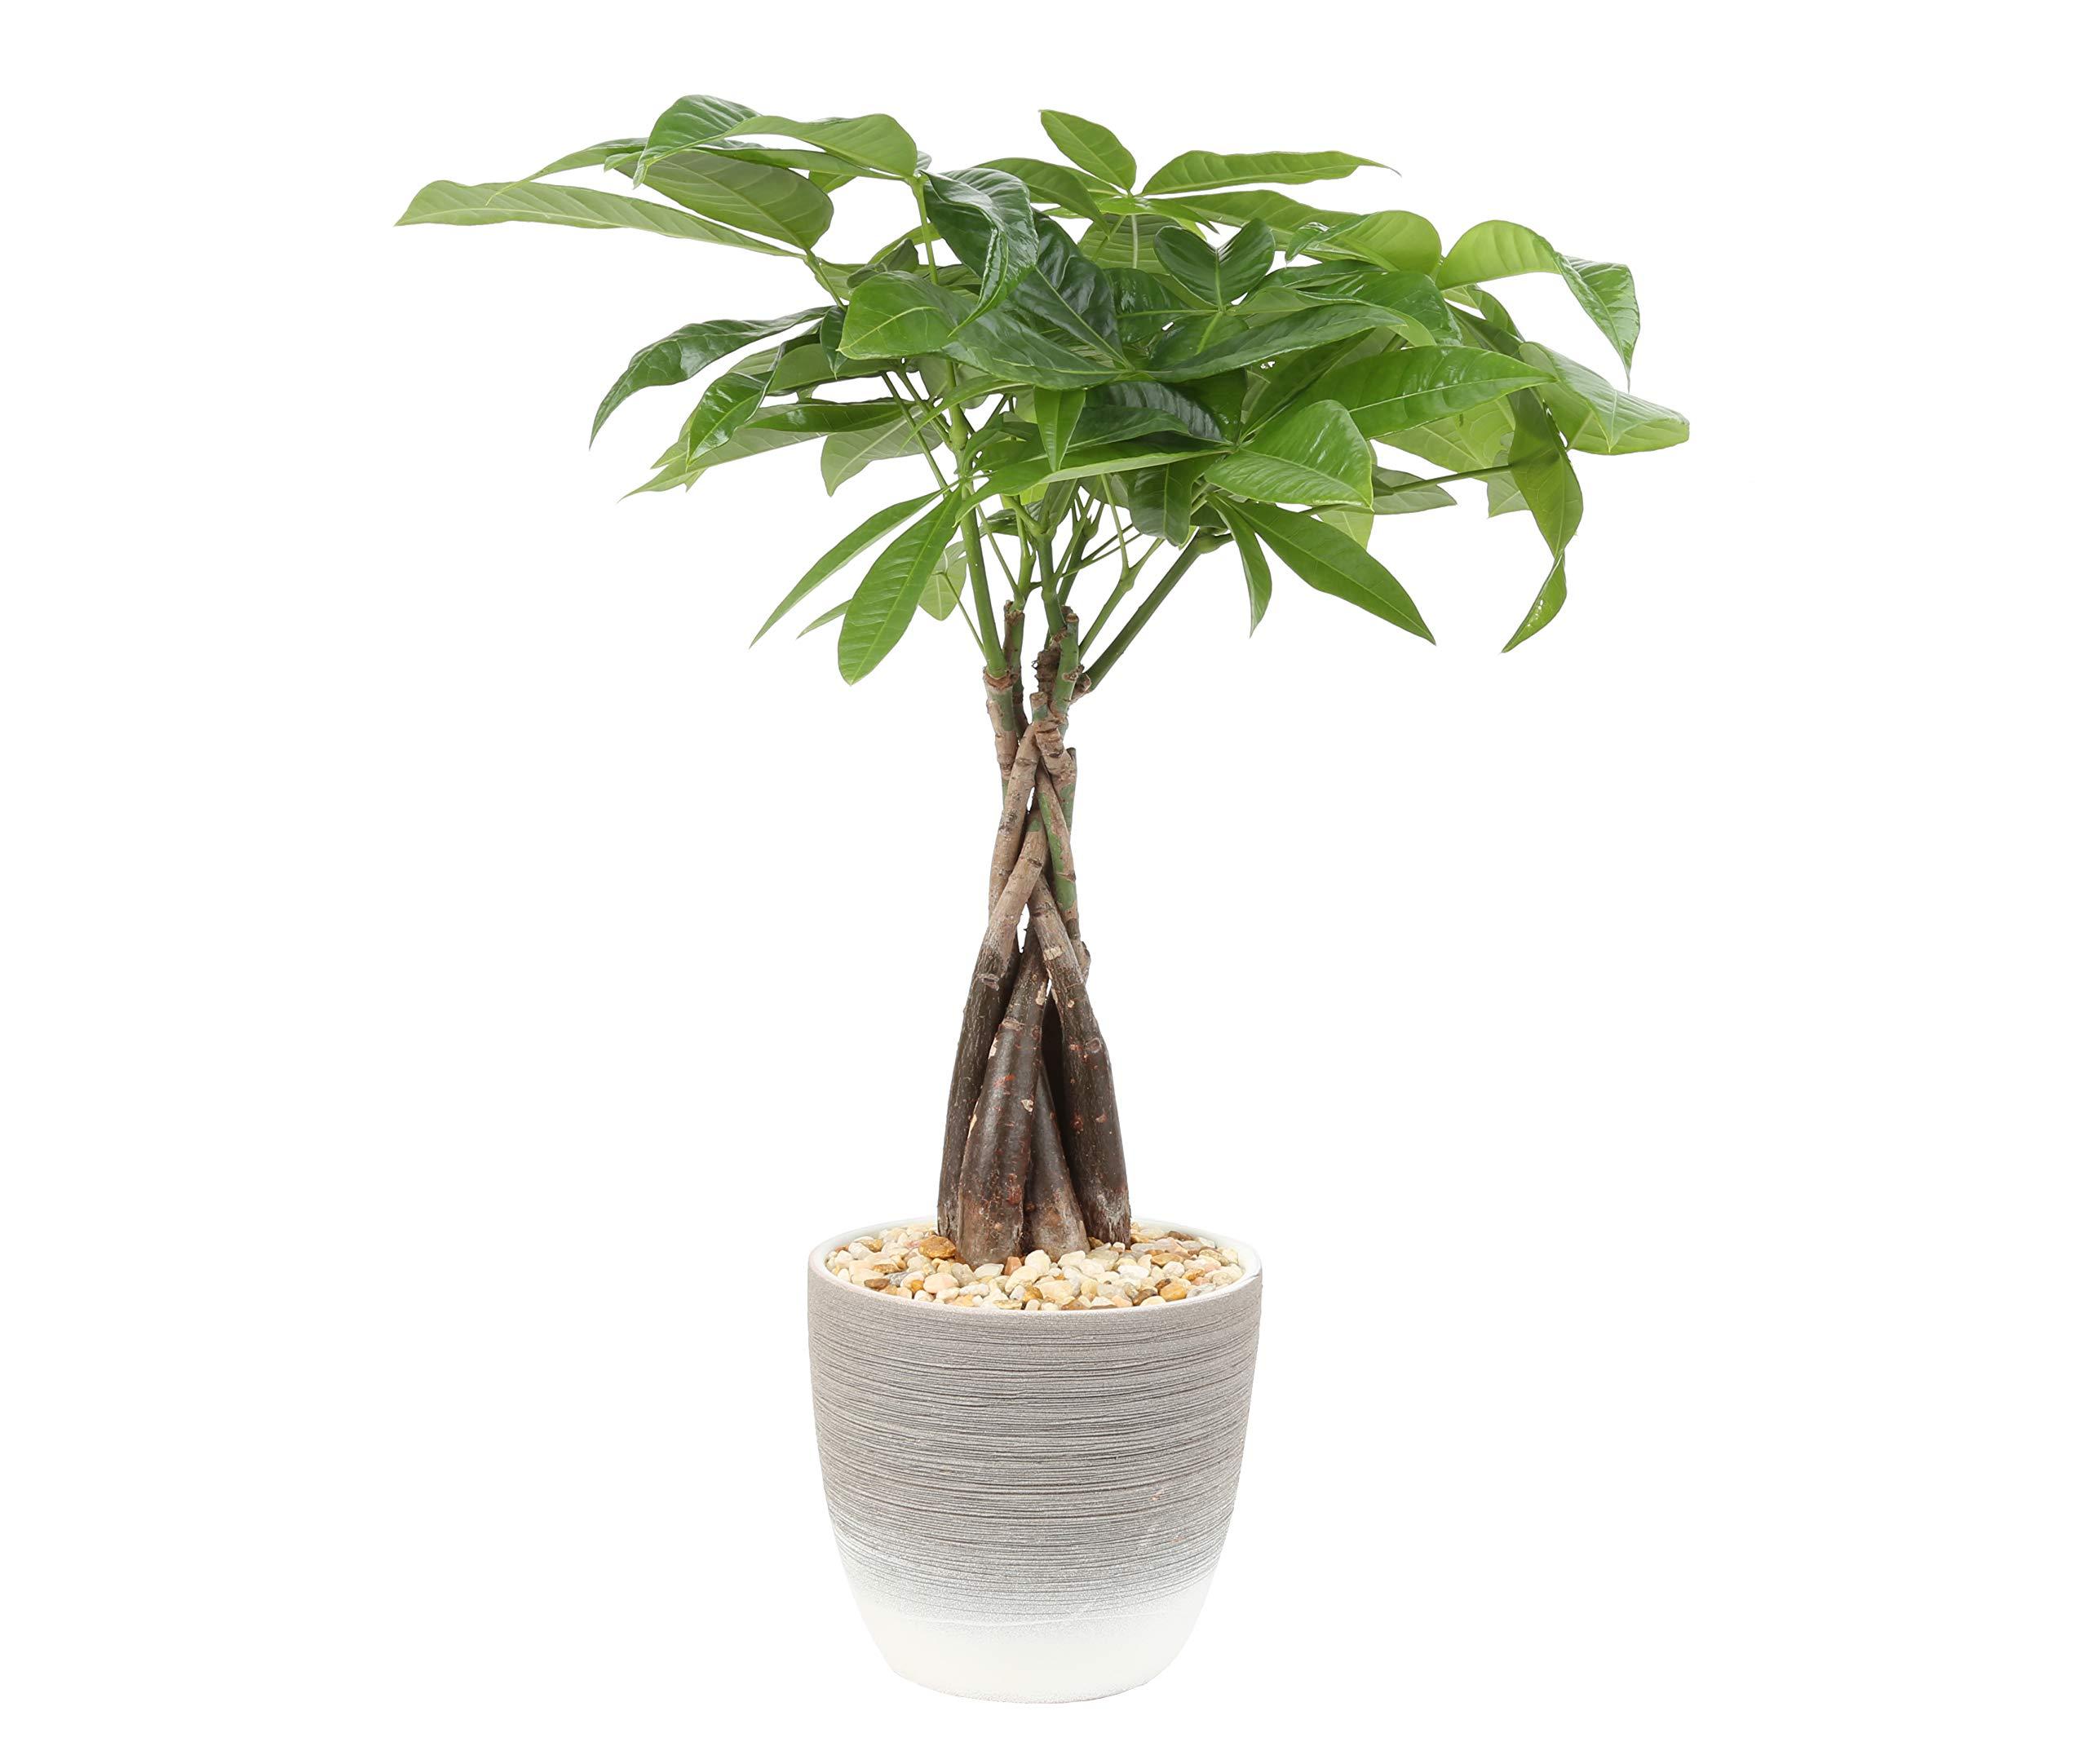 Costa Farms Money Tree, Pachira, Medium, Ships in Premium Ceramic Planter, 16-Inches Tall by Costa Farms